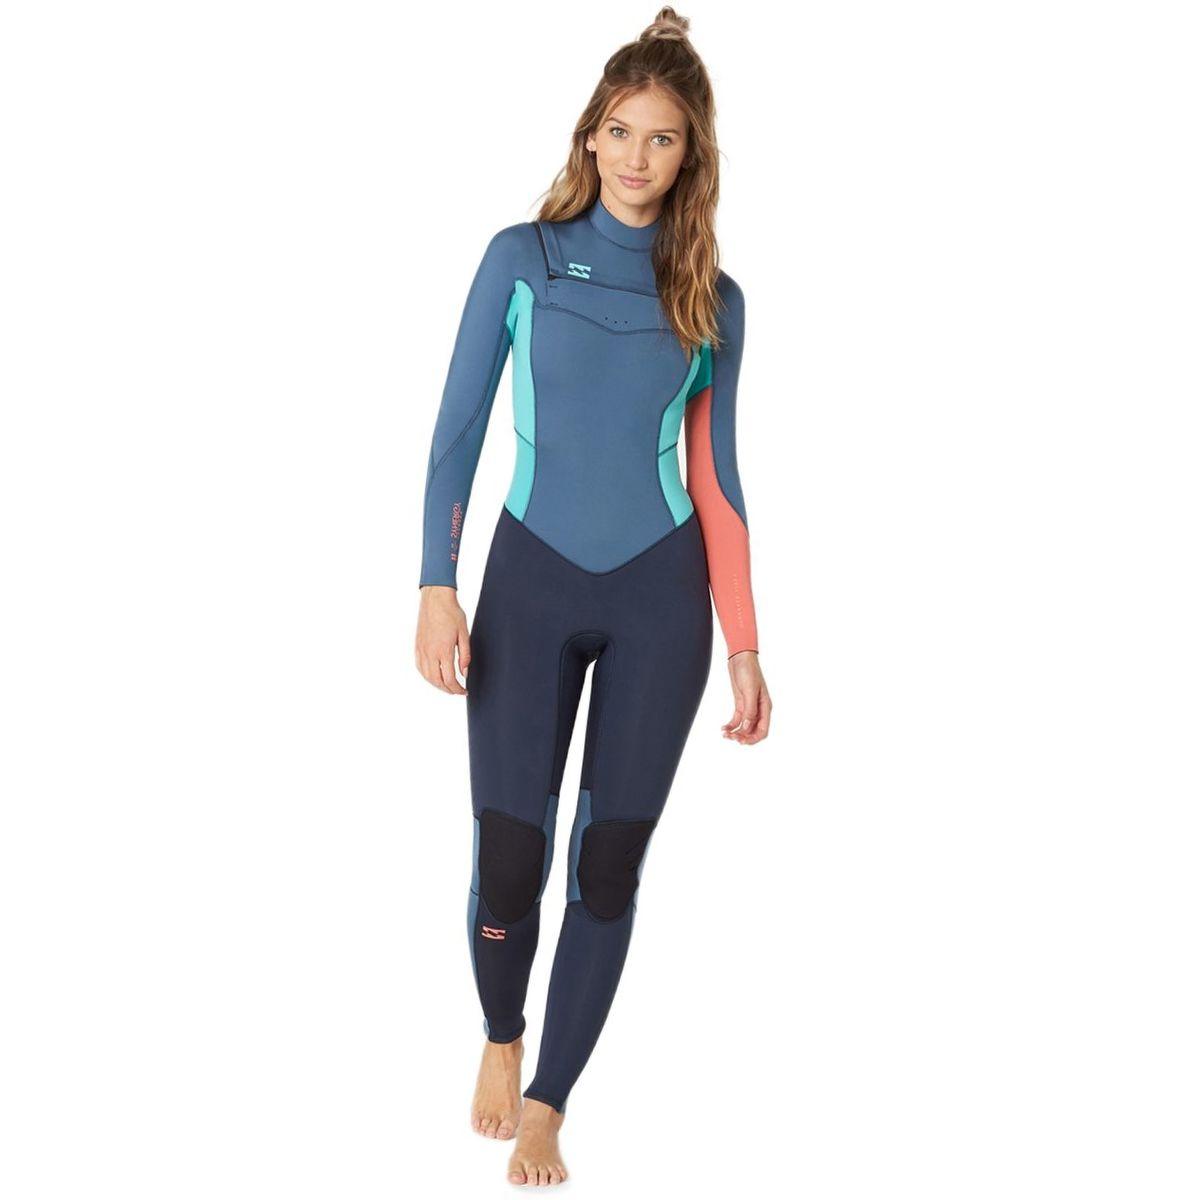 Billabong 4/3 Furnace Synergy Chest-Zip Full Wetsuit - Women's